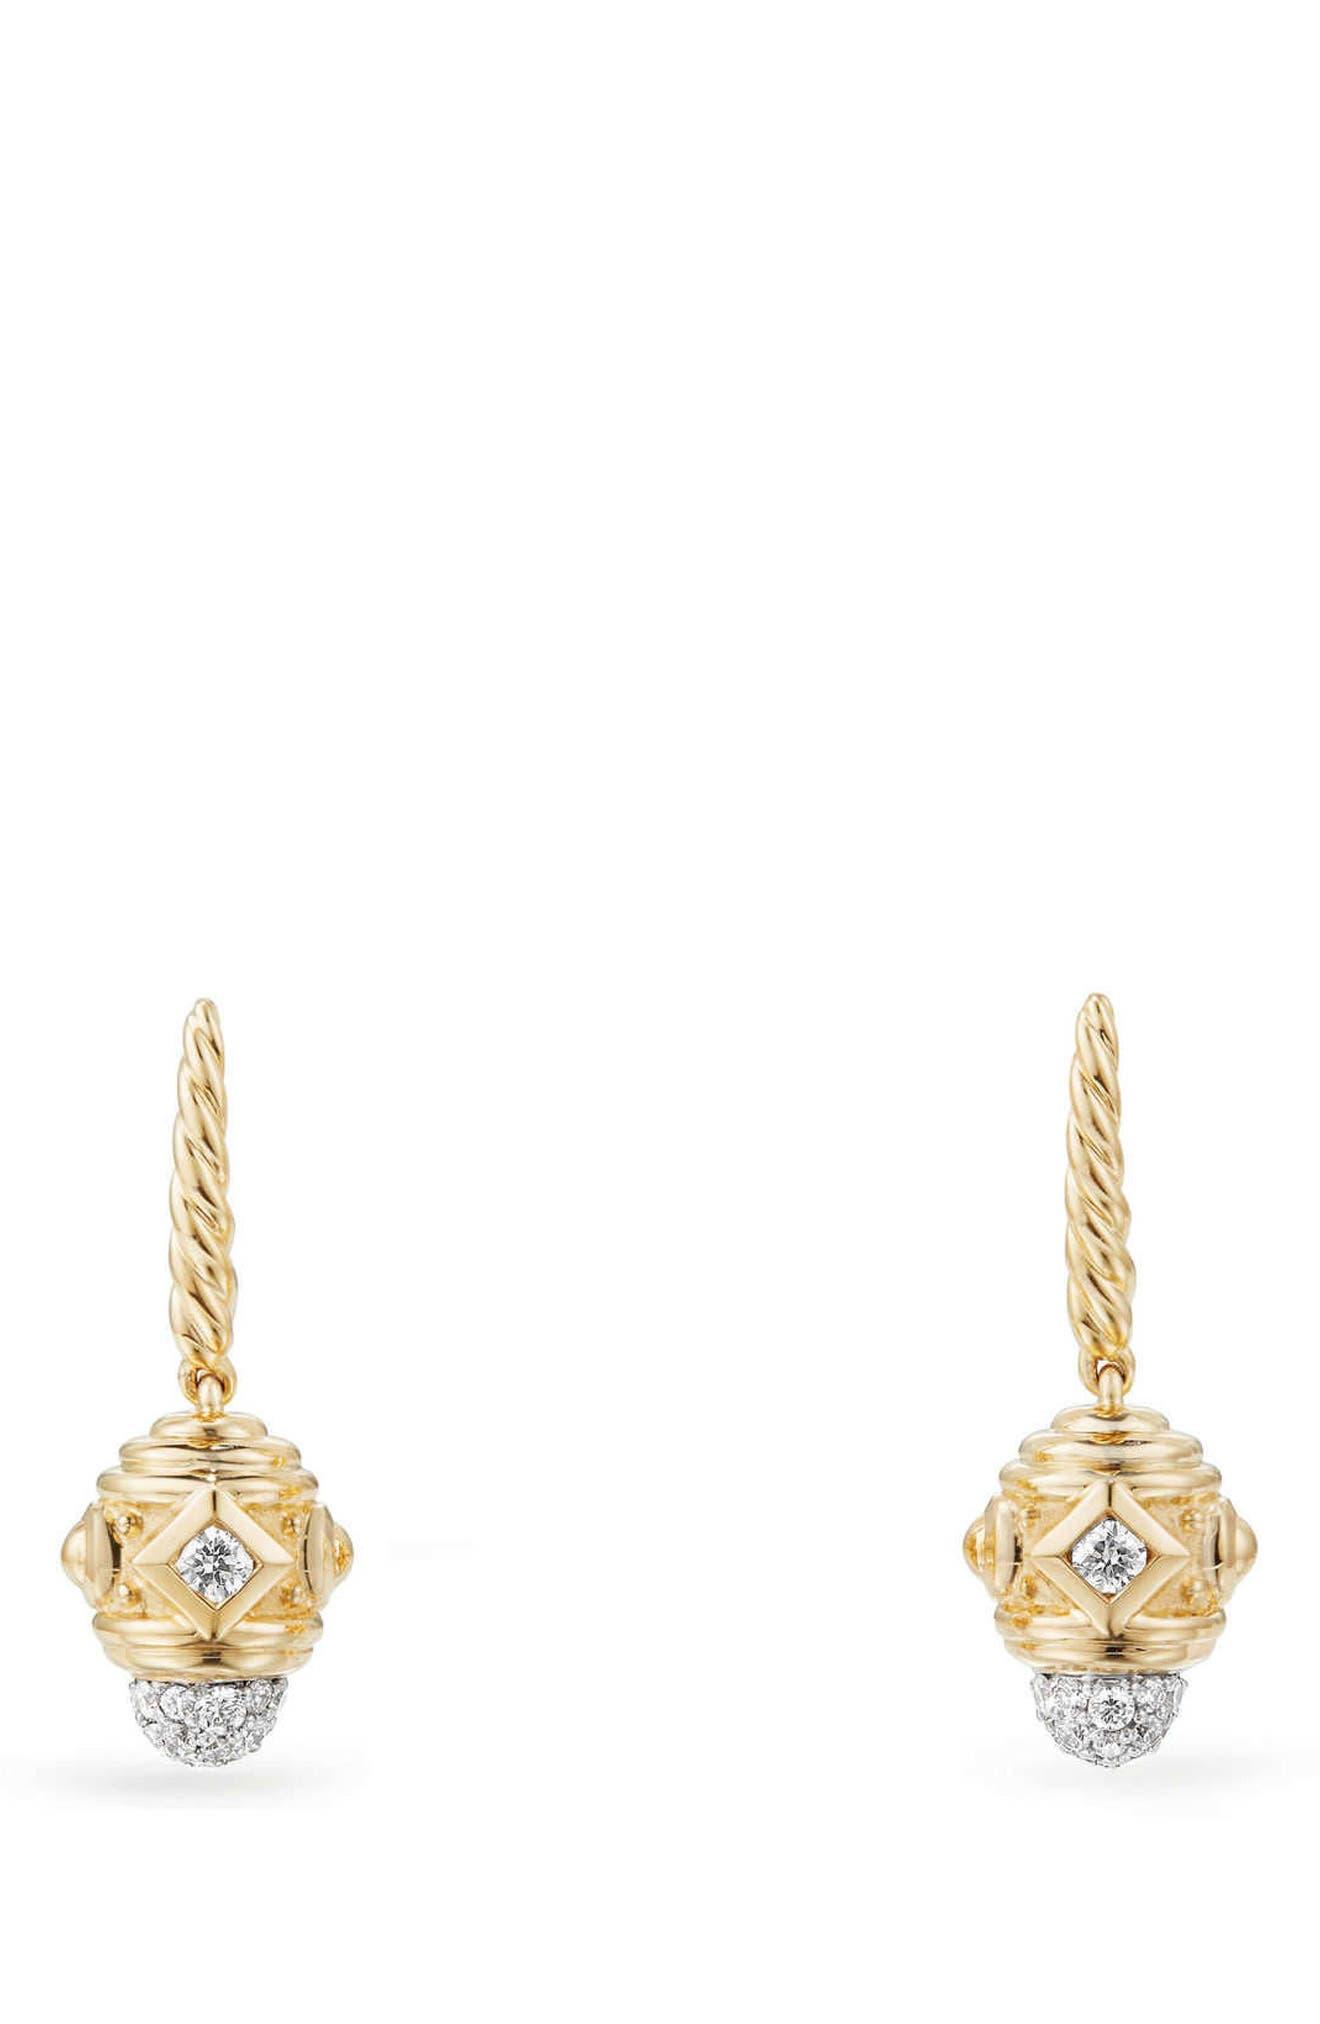 David Yurman Renaissance Drop Earrings with Diamonds in 18K Gold